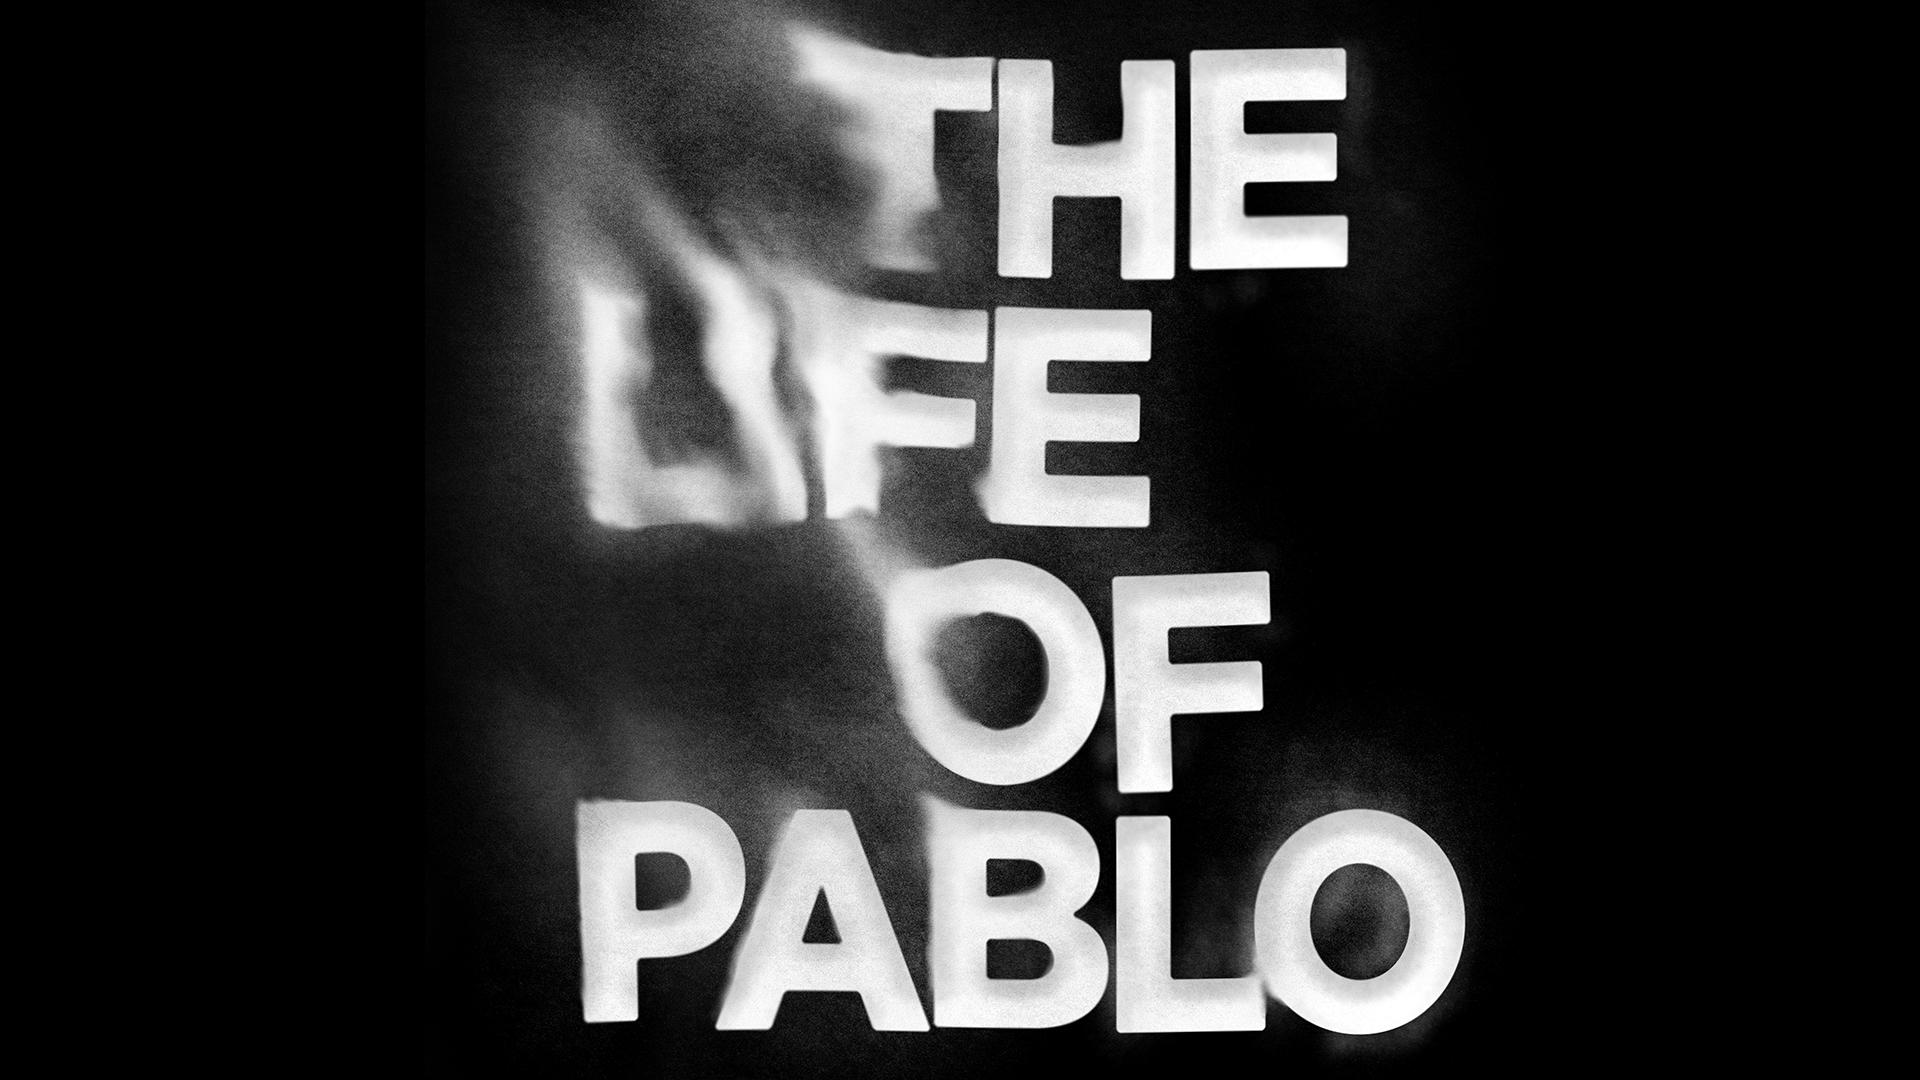 LifeofPablo